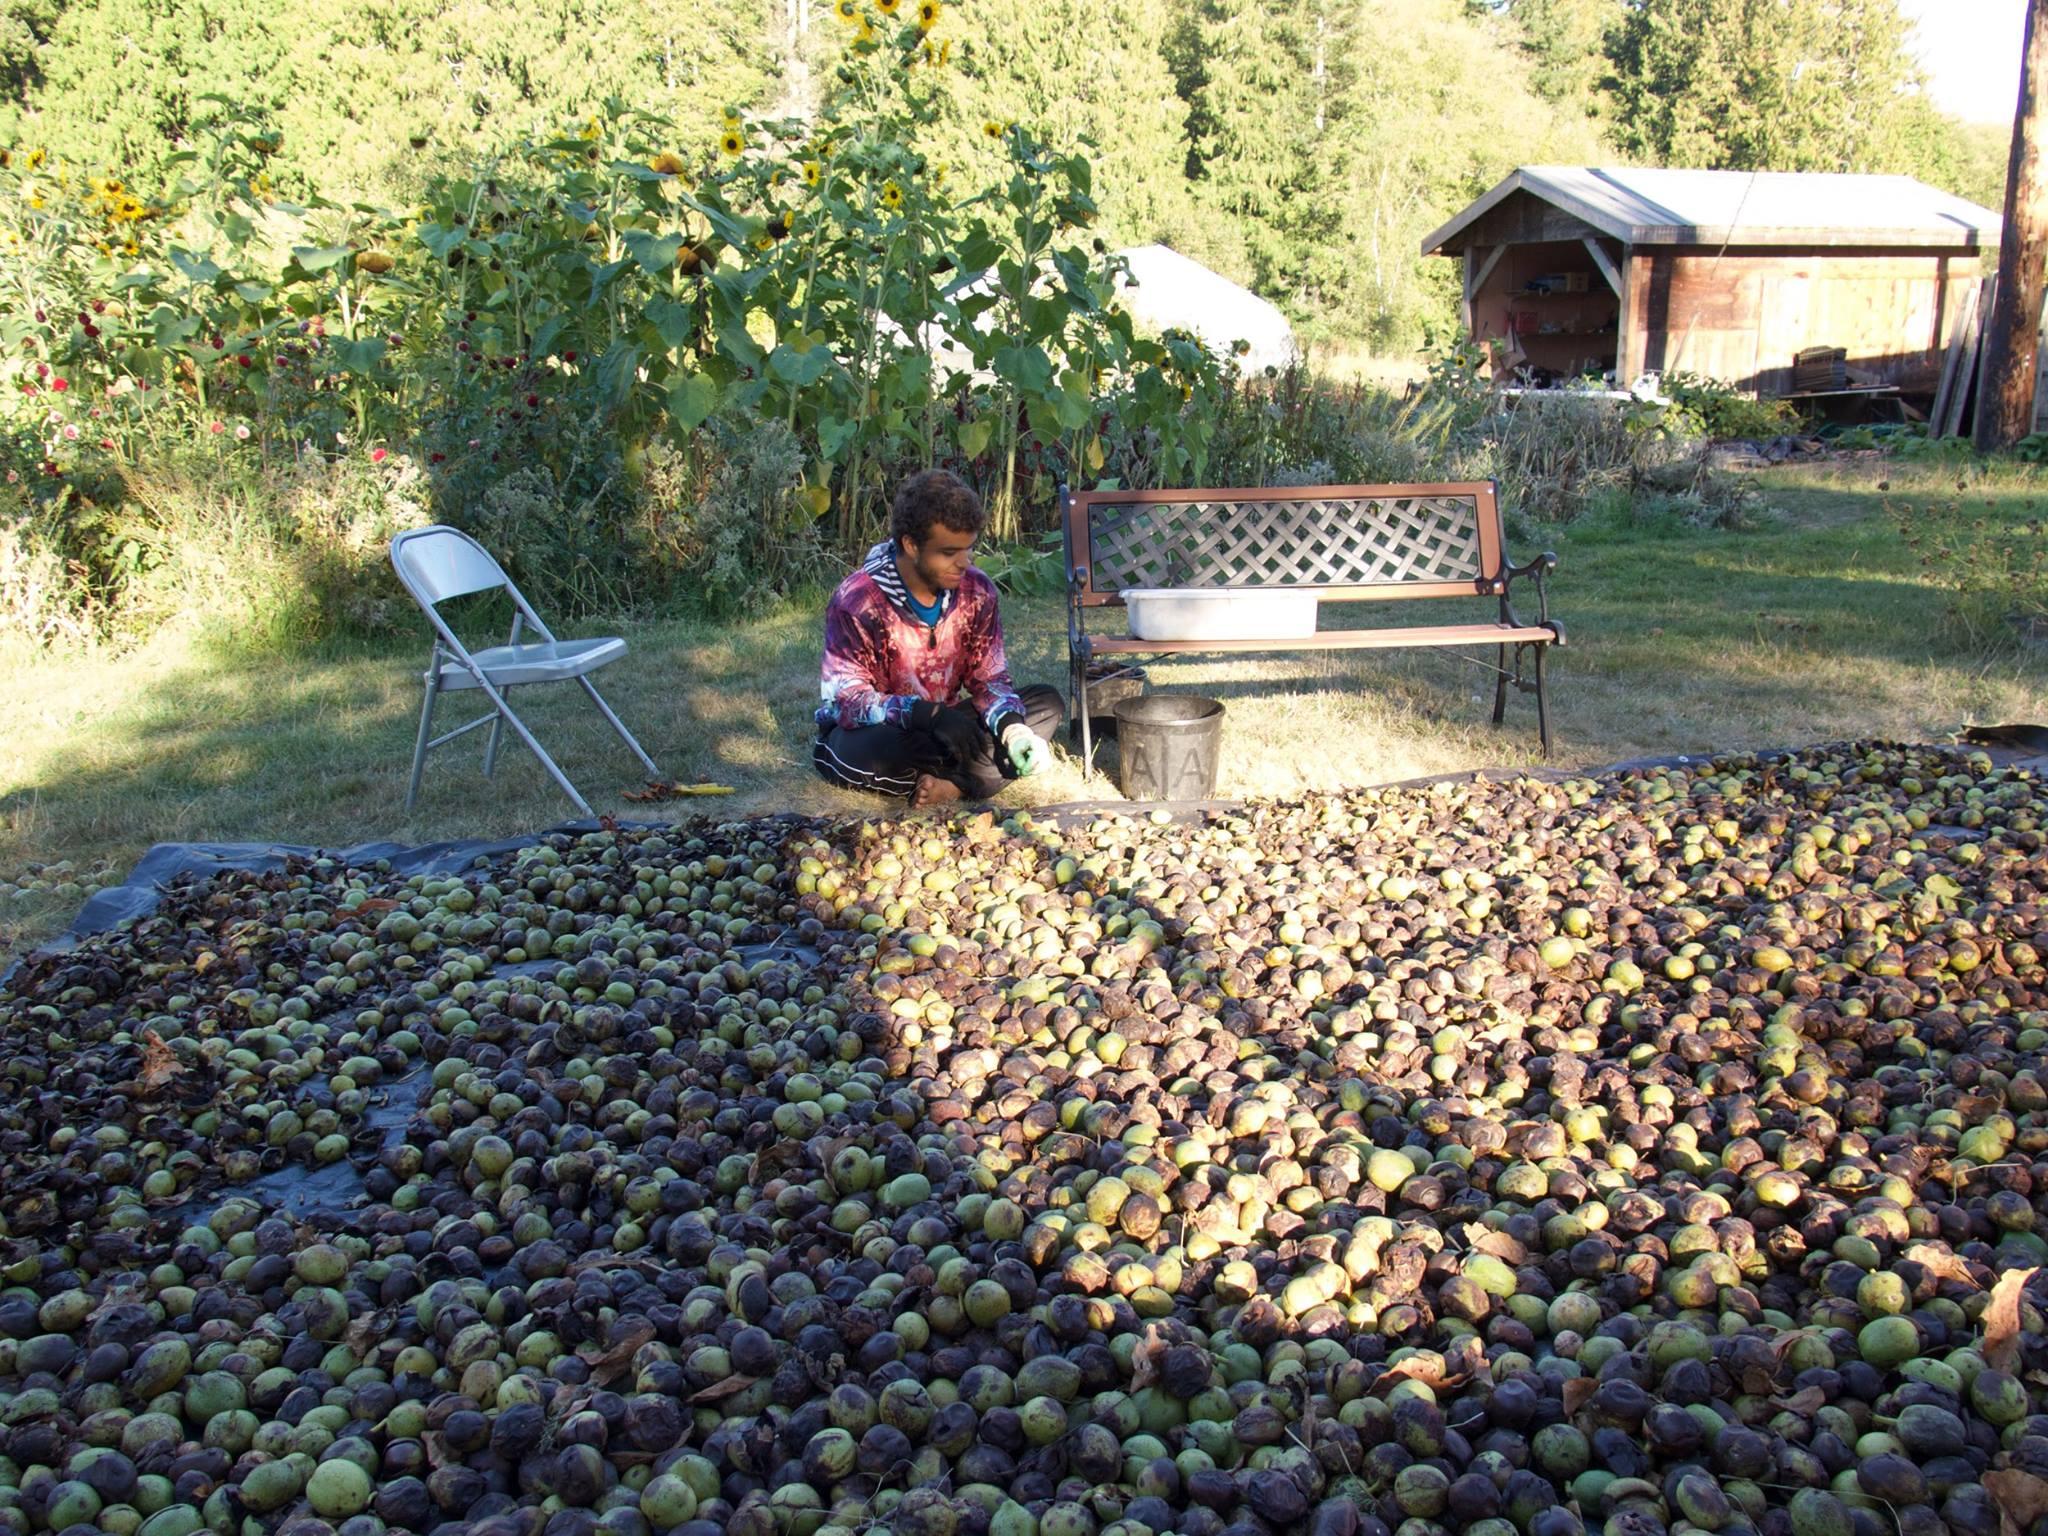 Carnel sorting the walnut bounty